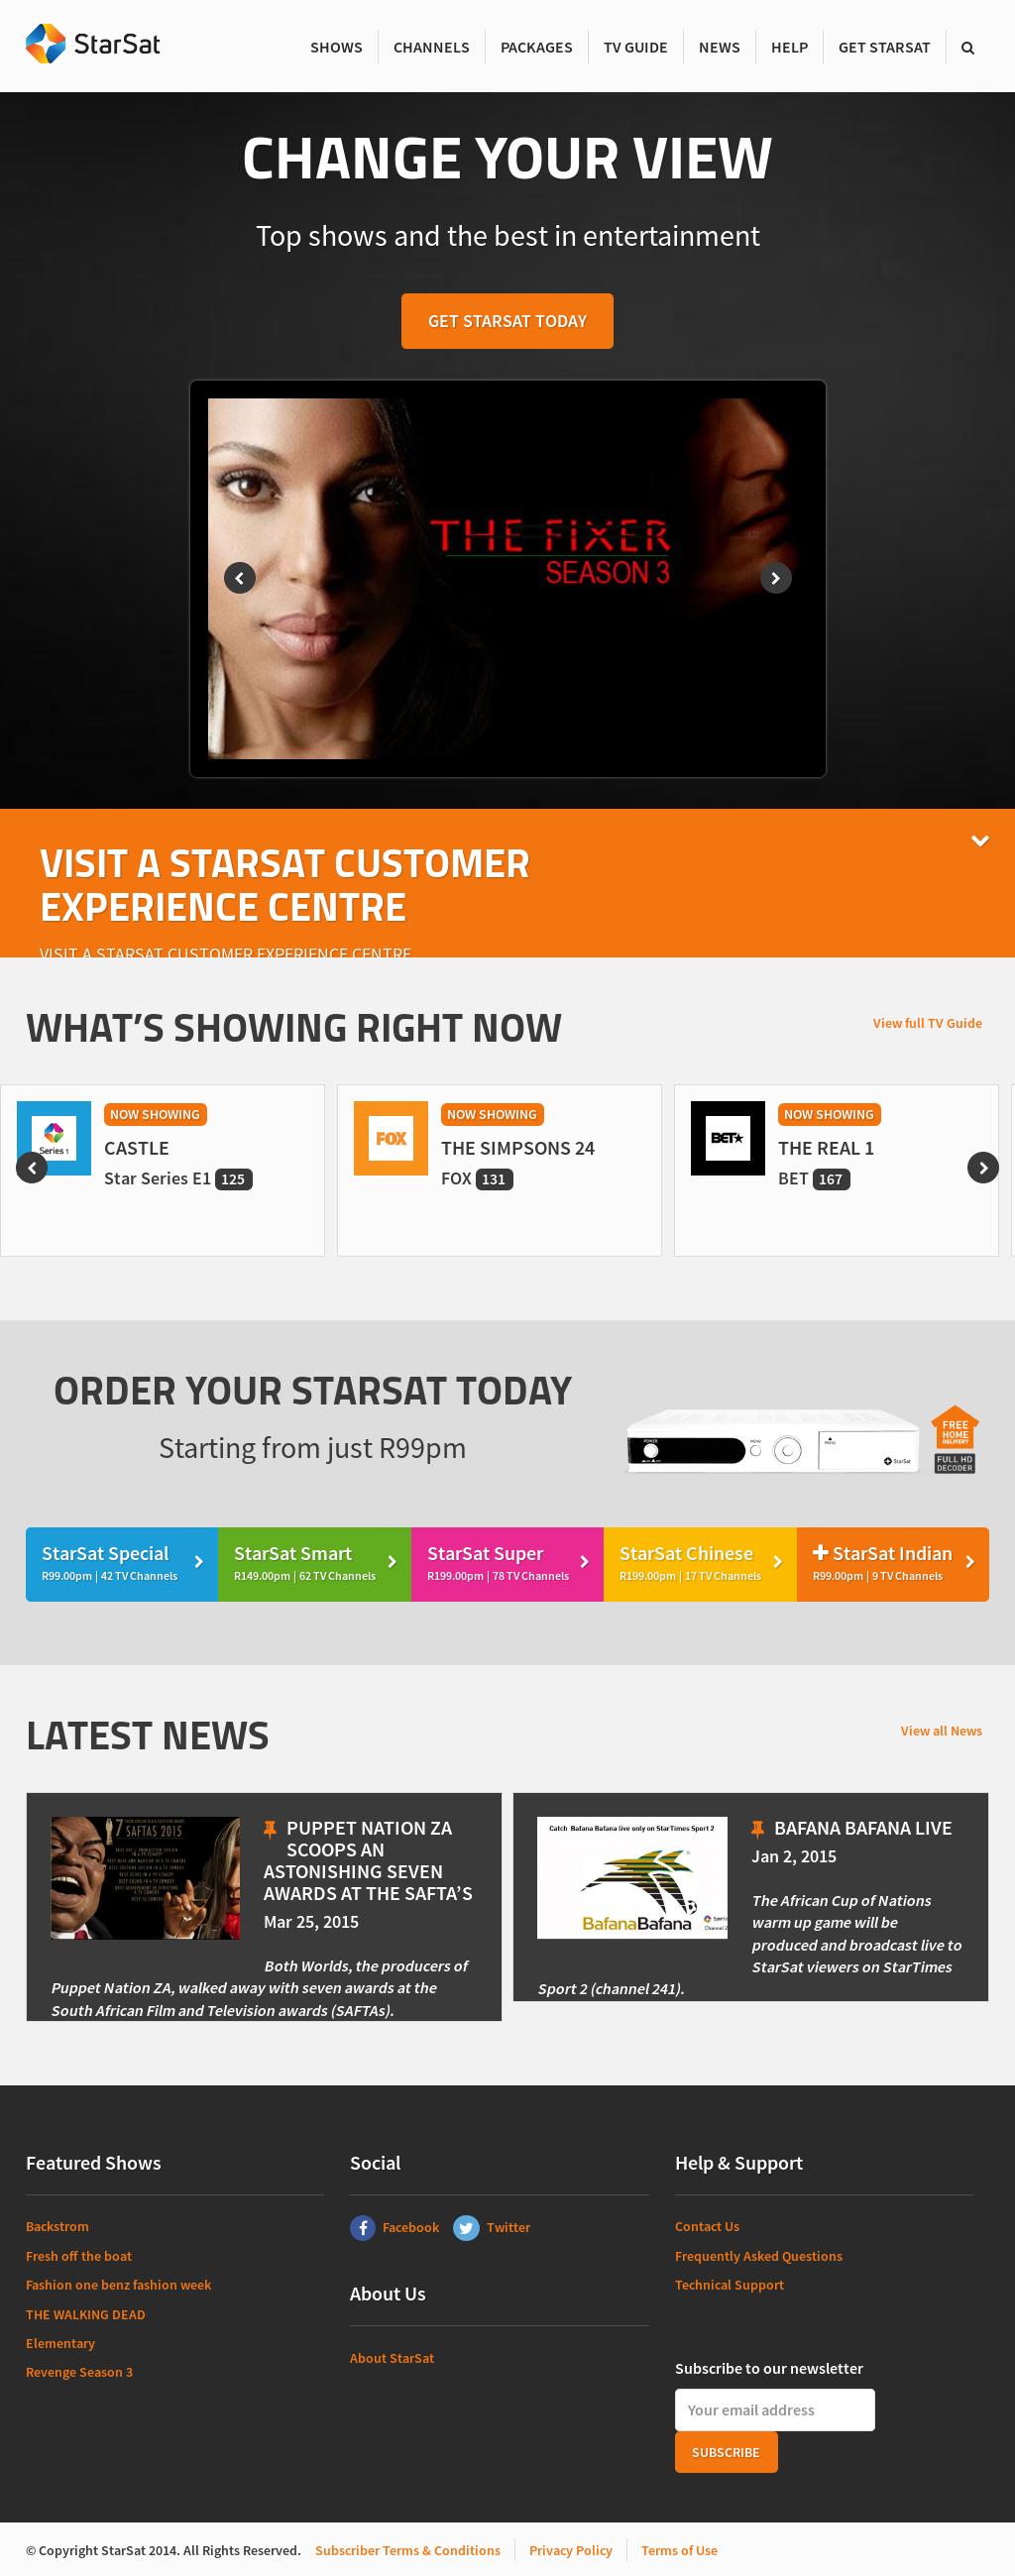 StarSat Competitors, Revenue and Employees - Owler Company Profile